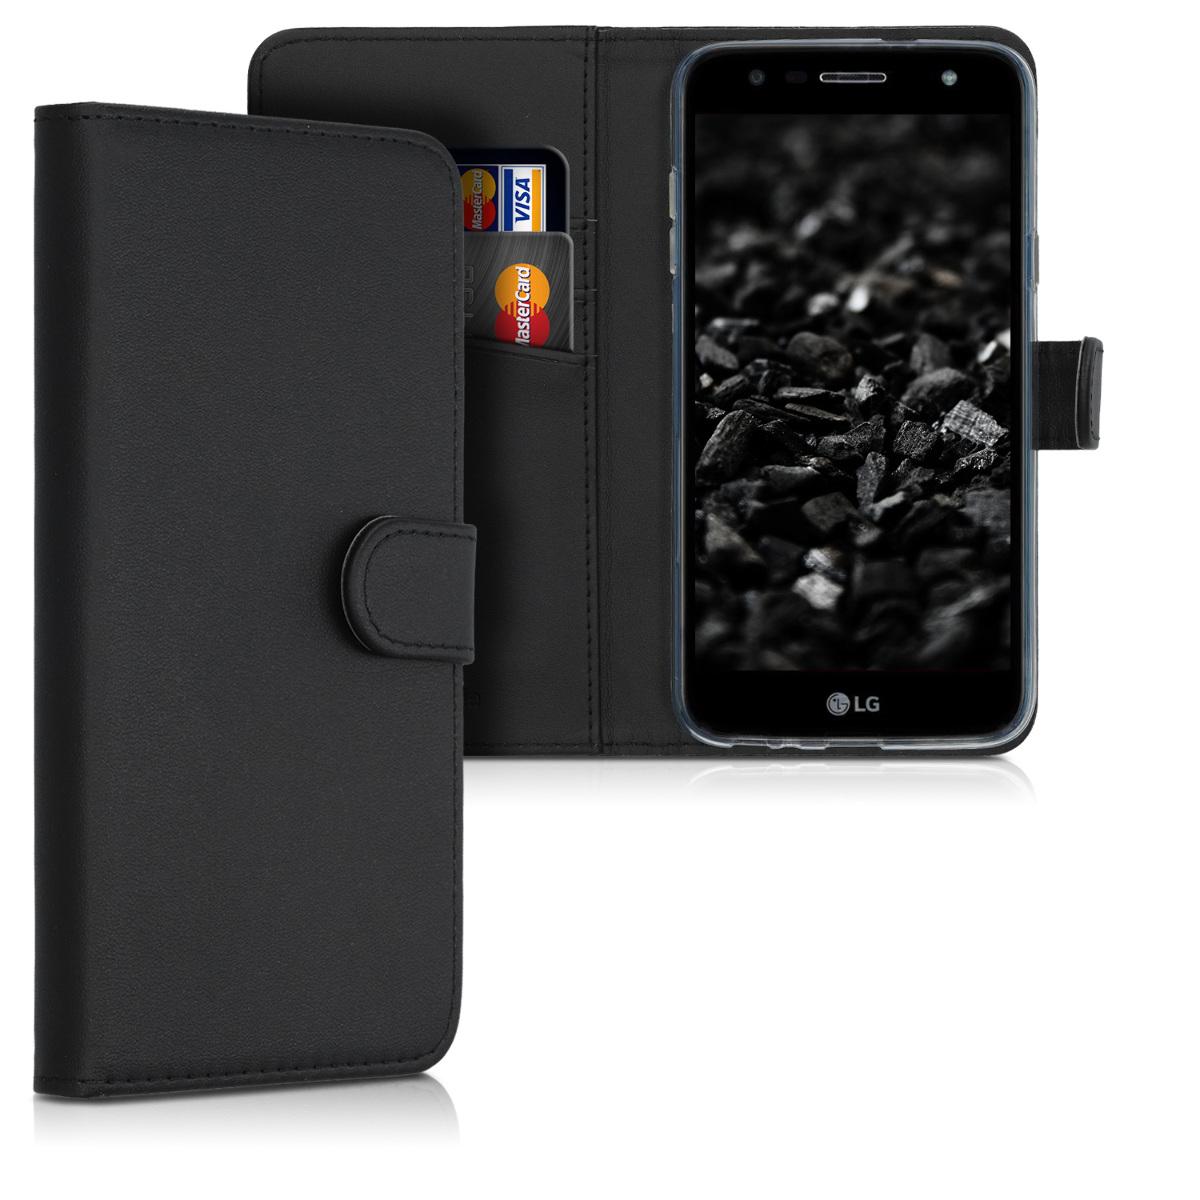 KW Θήκη Πορτοφόλι LG X power 3 - Black (49885.01)